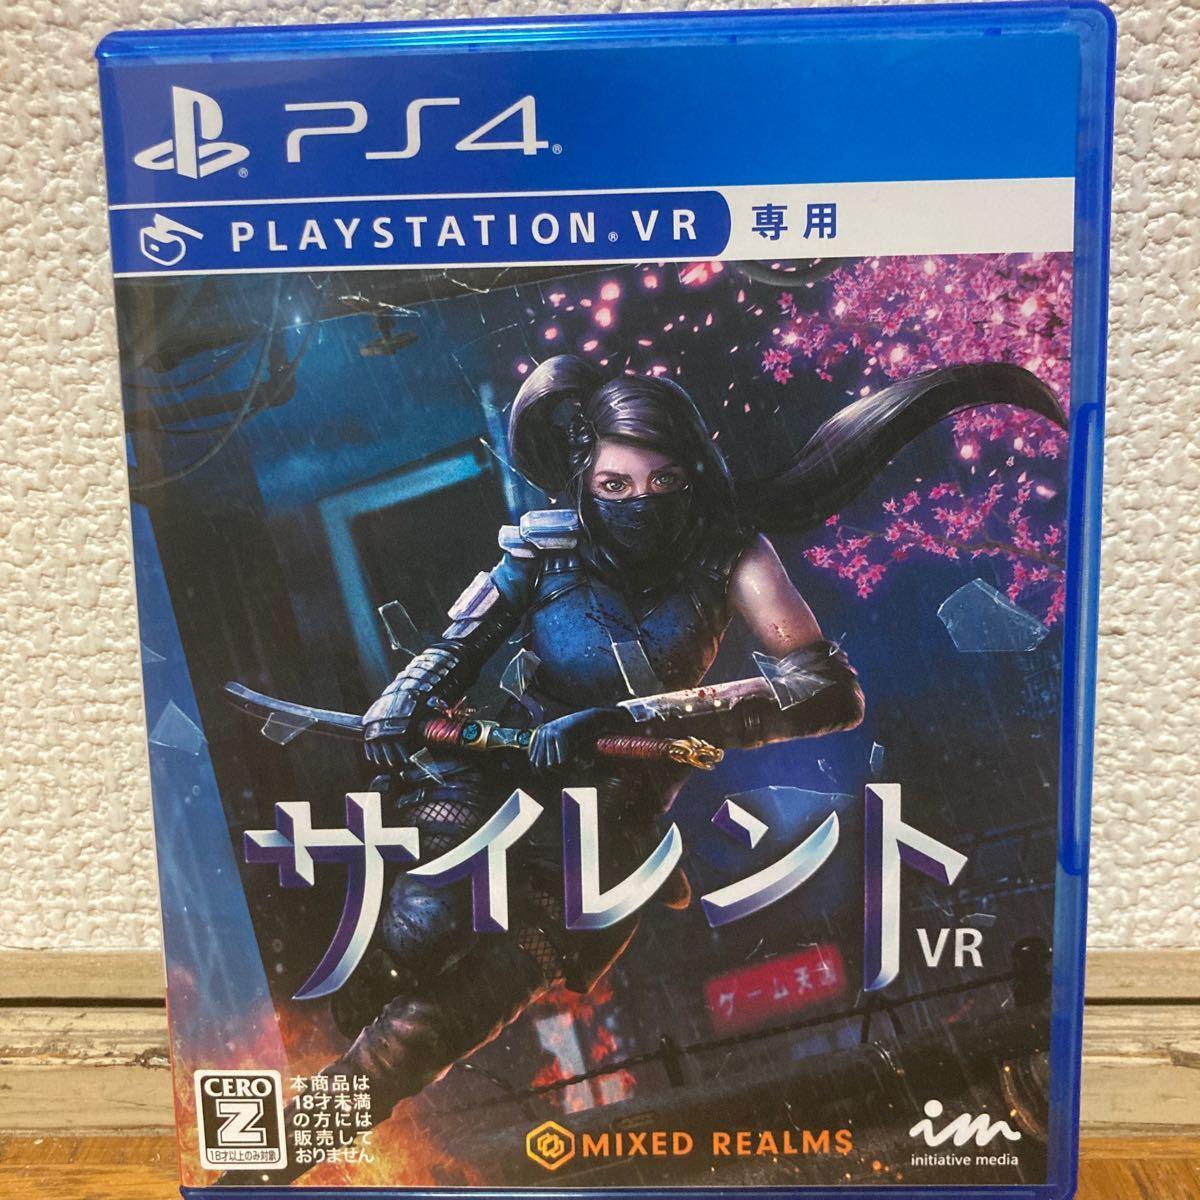 PS4 VR サイレントVR